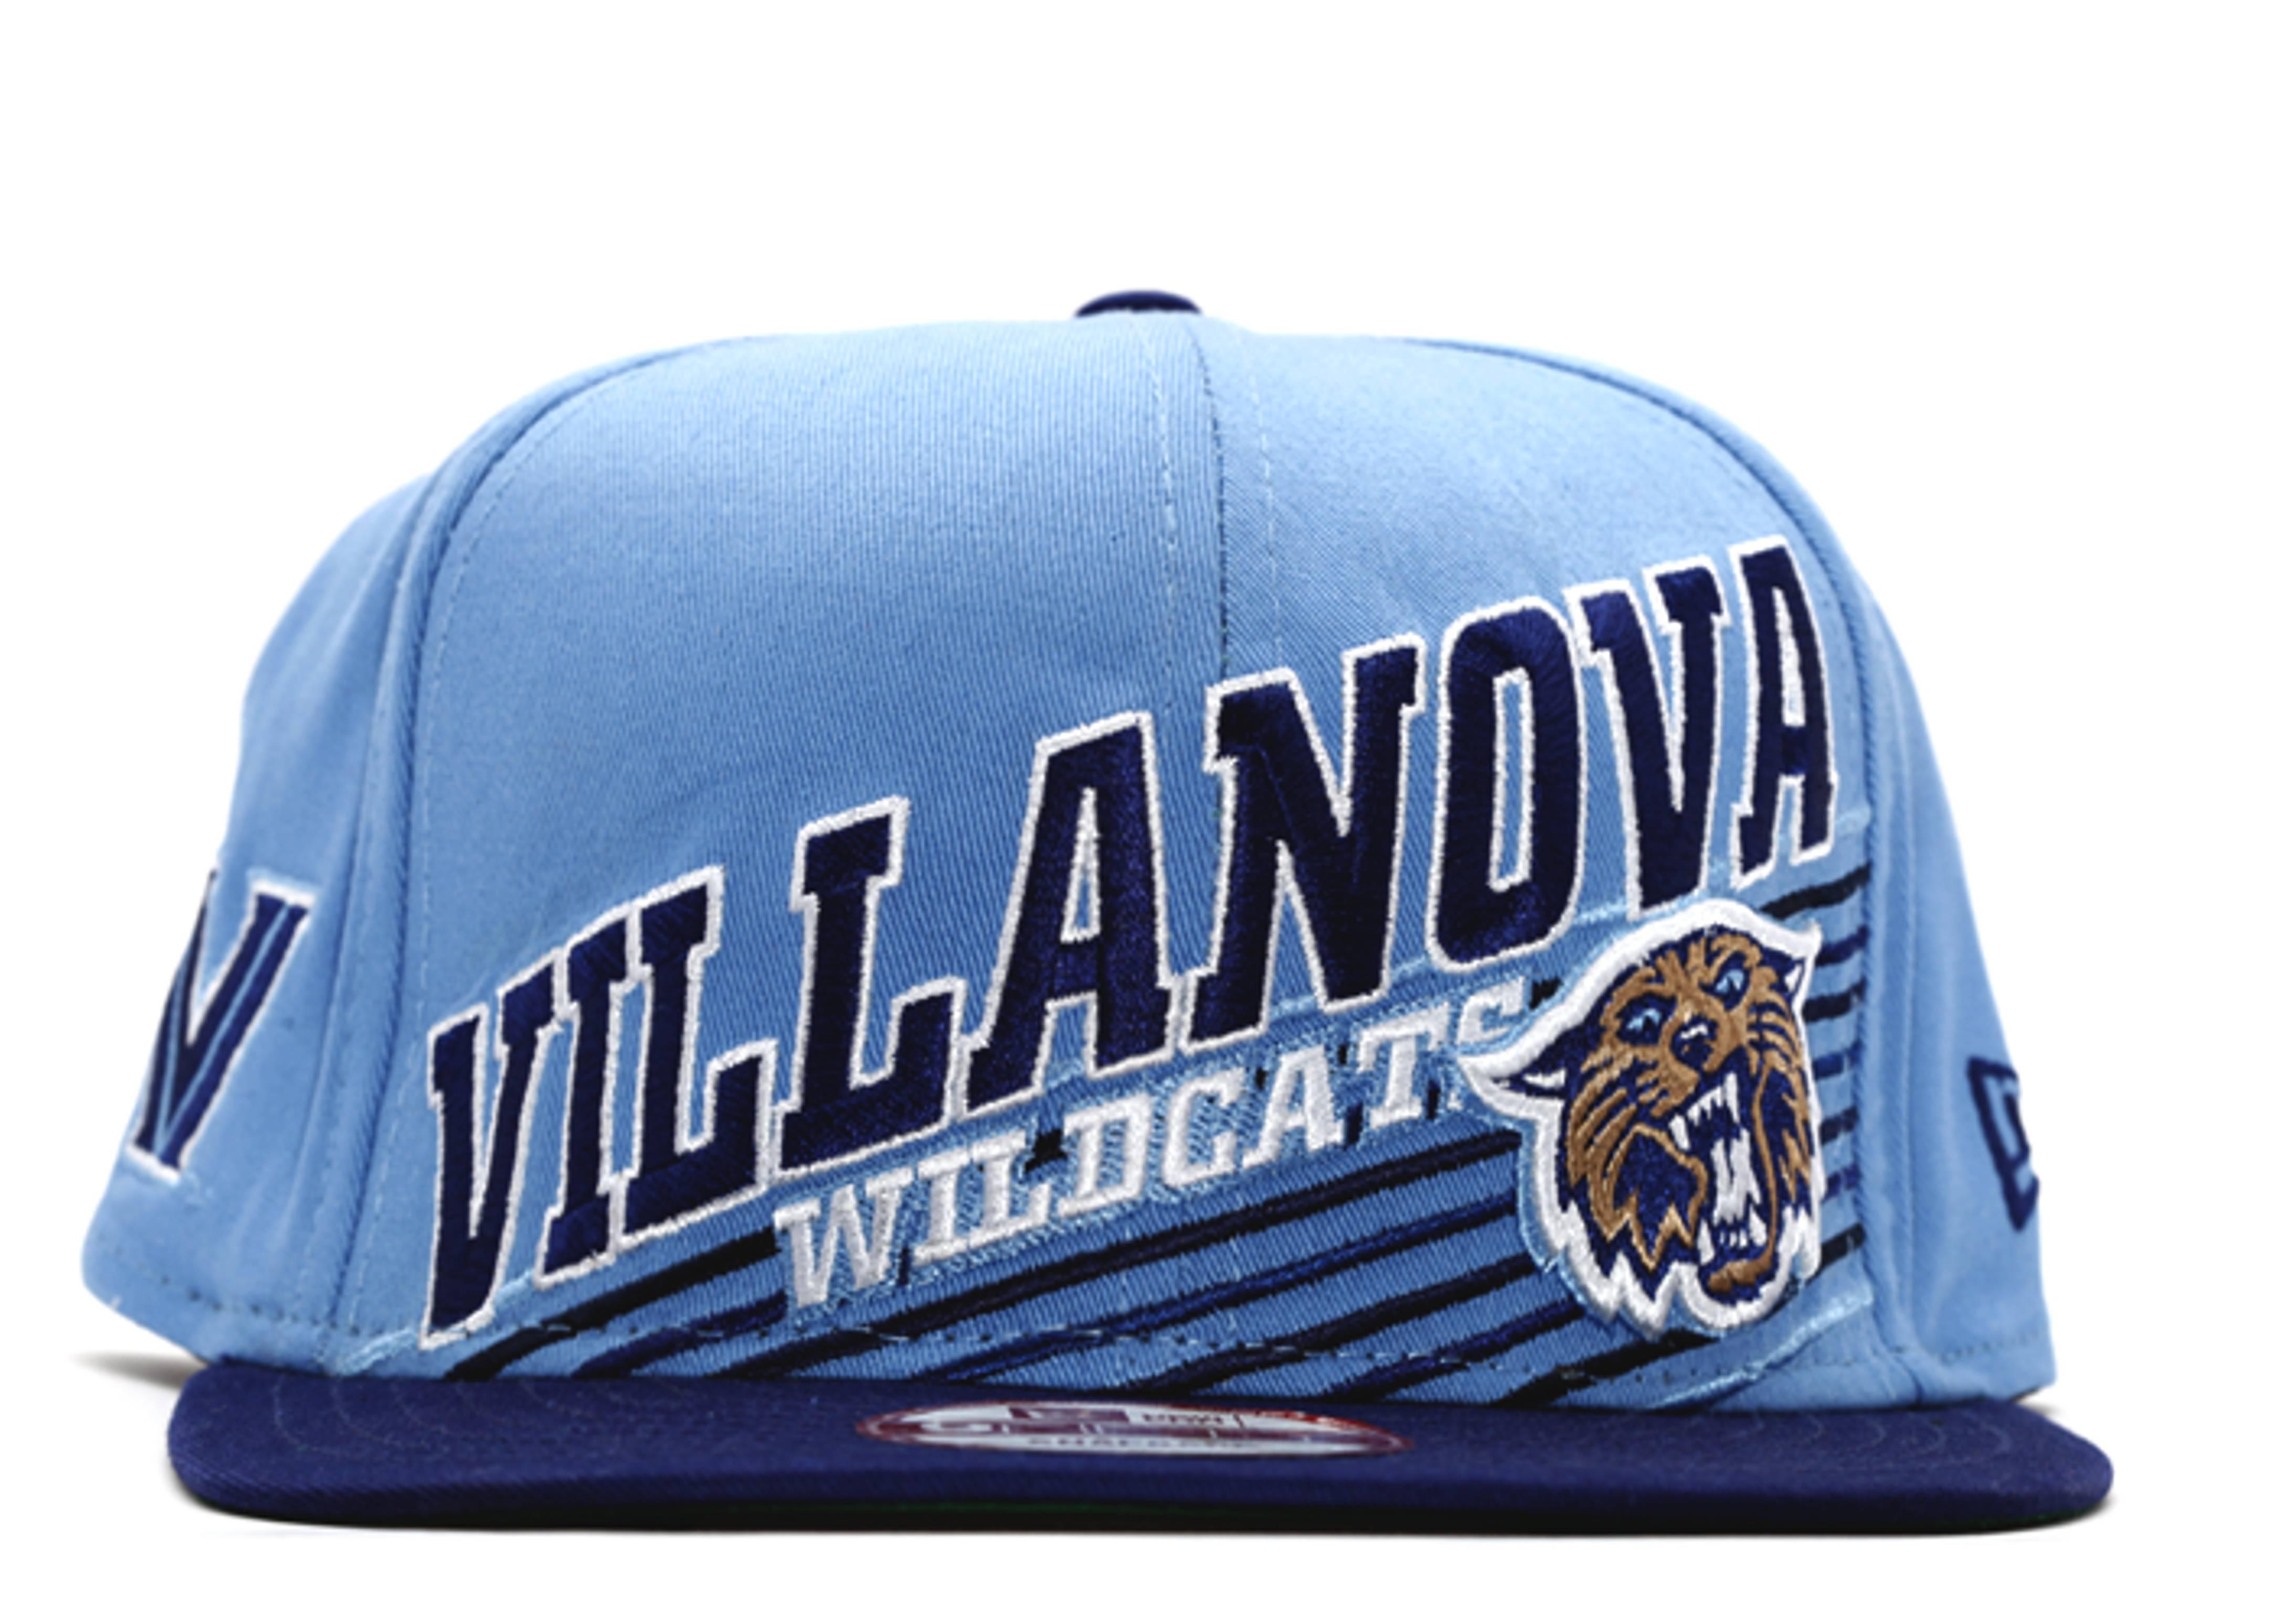 villanova wildcats snap-back